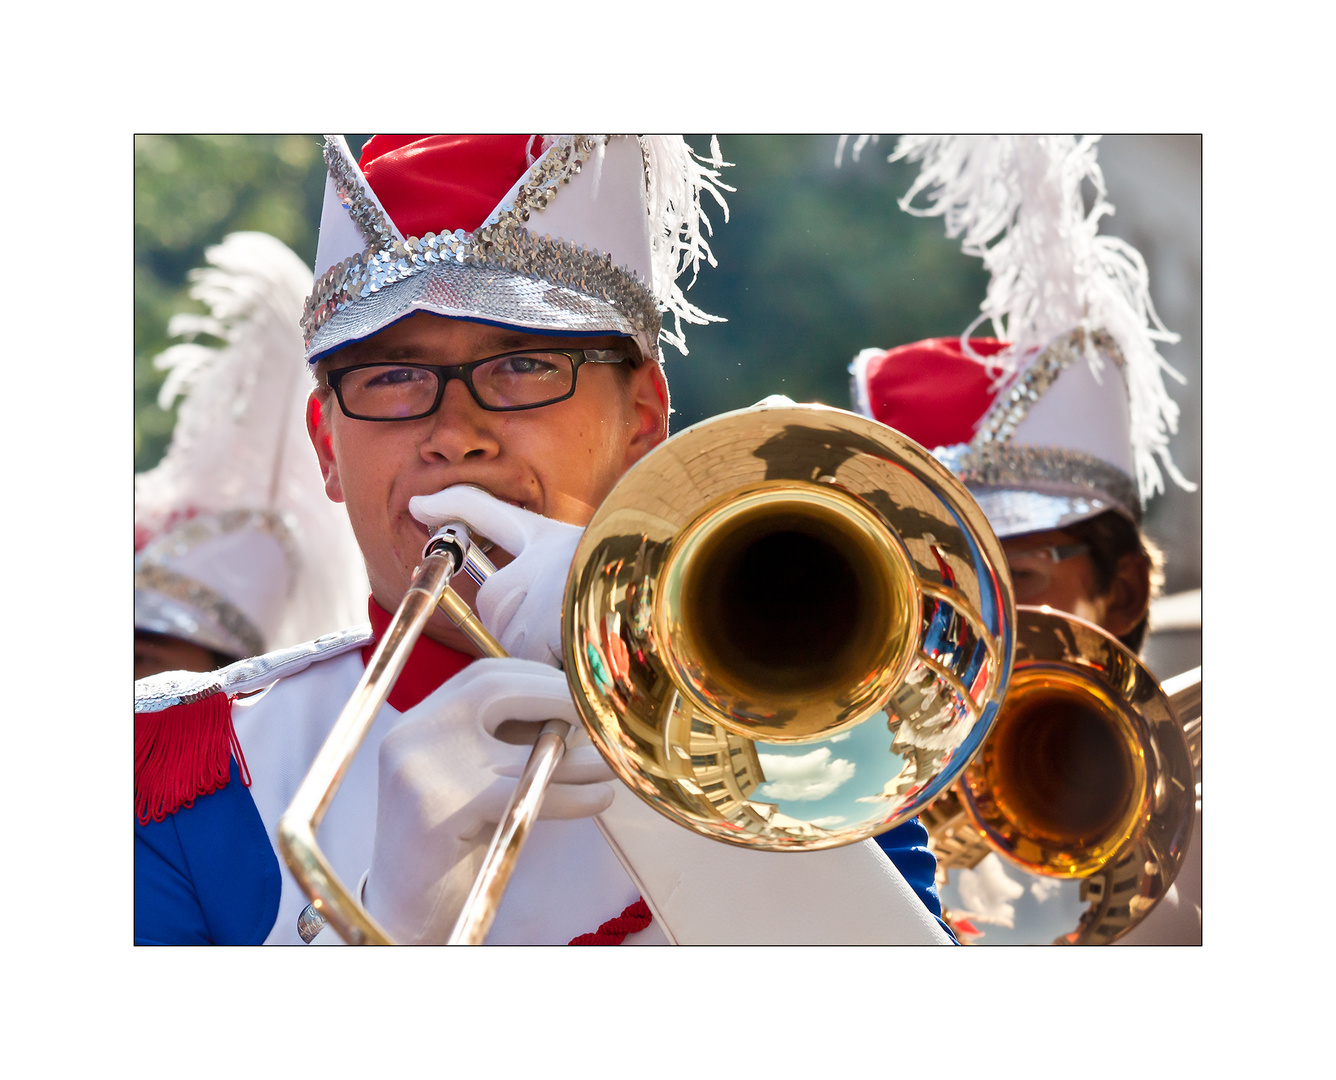 Marching Bands IX